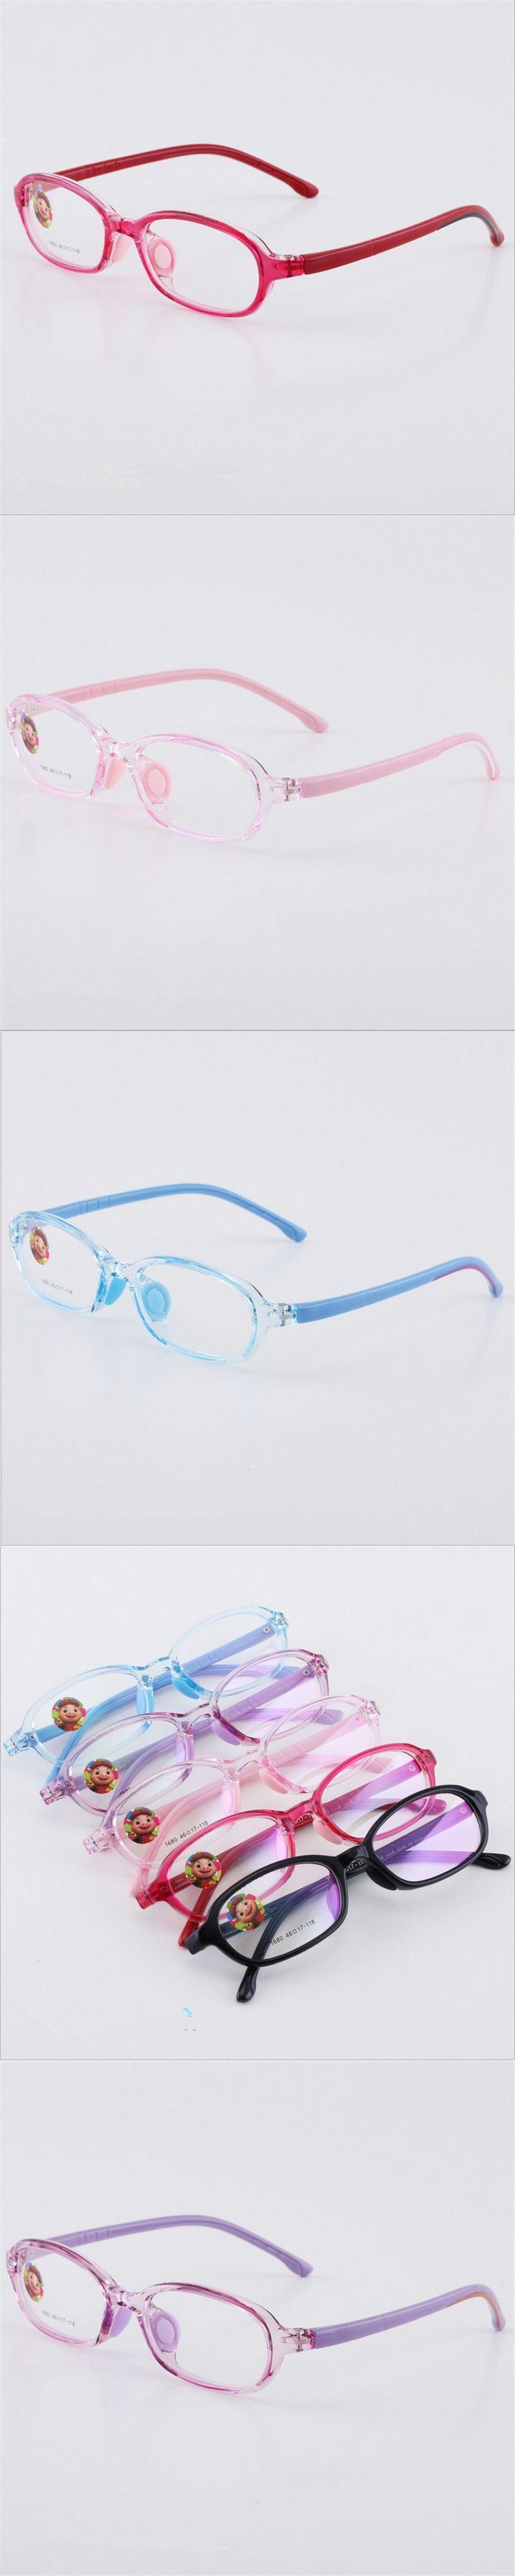 TR90 Glasses Boy Girl Eyeglasses Lightweight Flexible Eyewear Frame Children Prescription Glasses frame Silicone nose care 1680